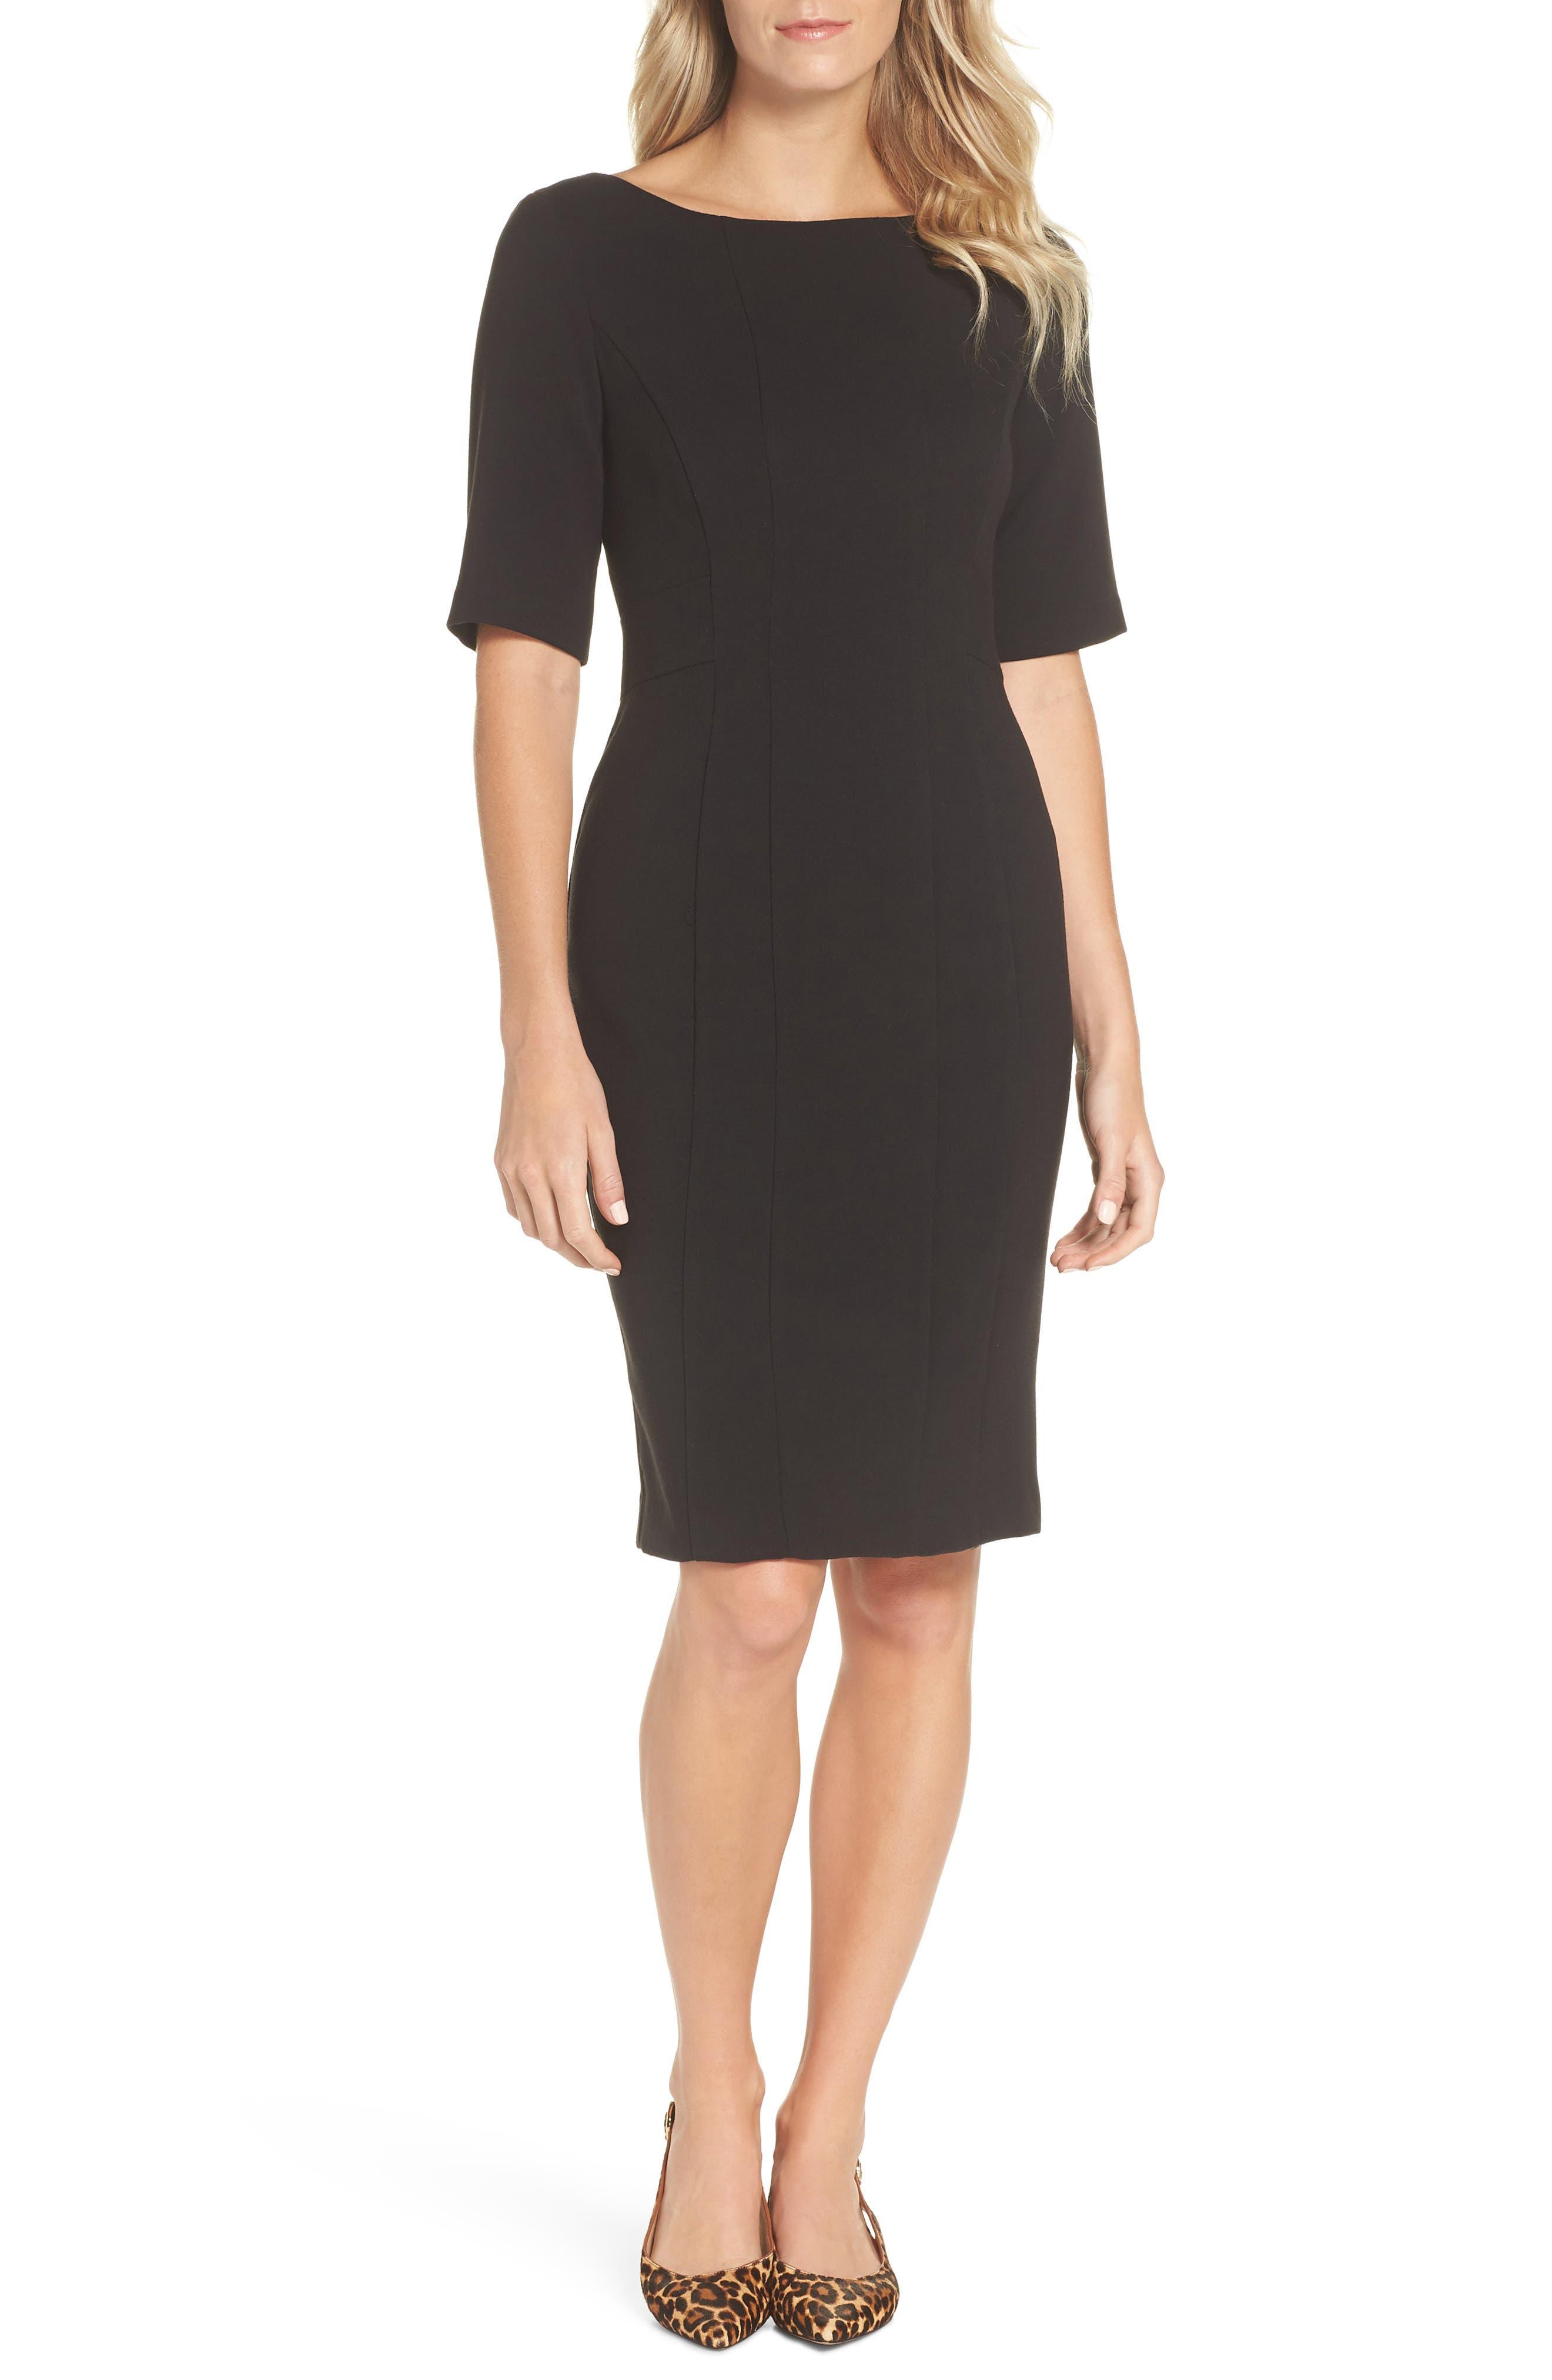 ELIZA J, Bateau Neck Crepe Sheath Dress, Main thumbnail 1, color, BLACK